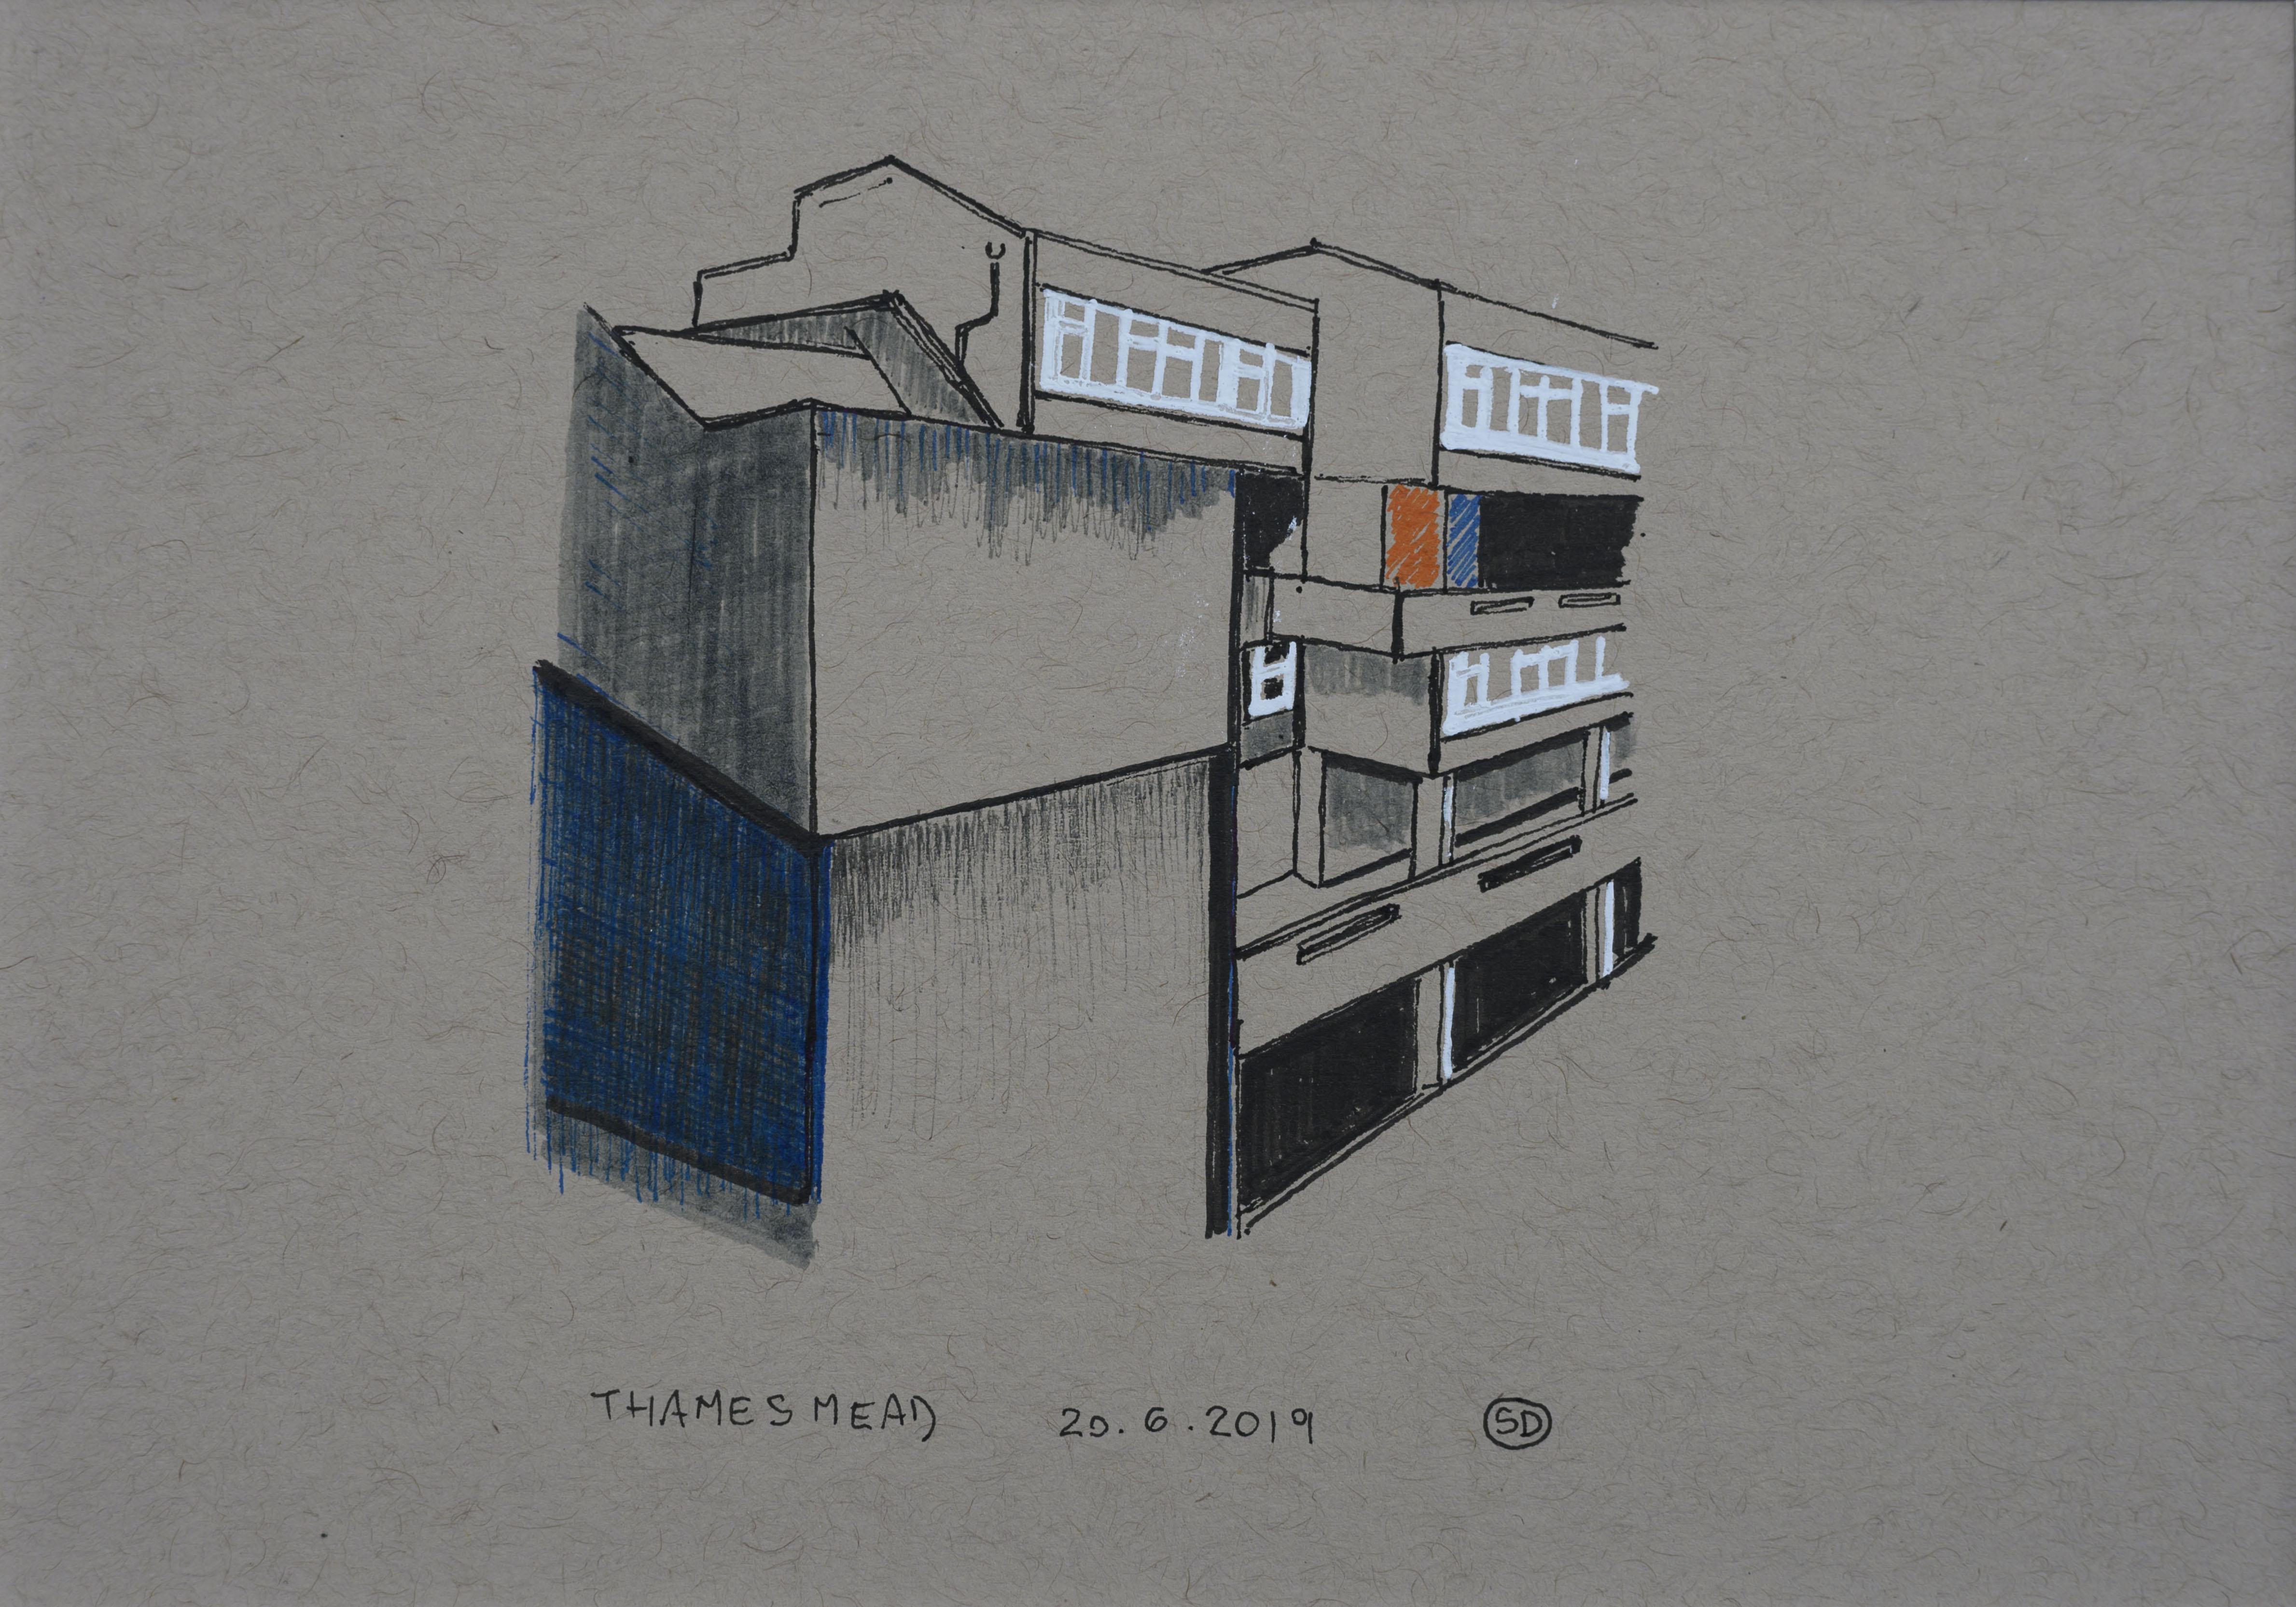 Thameshead